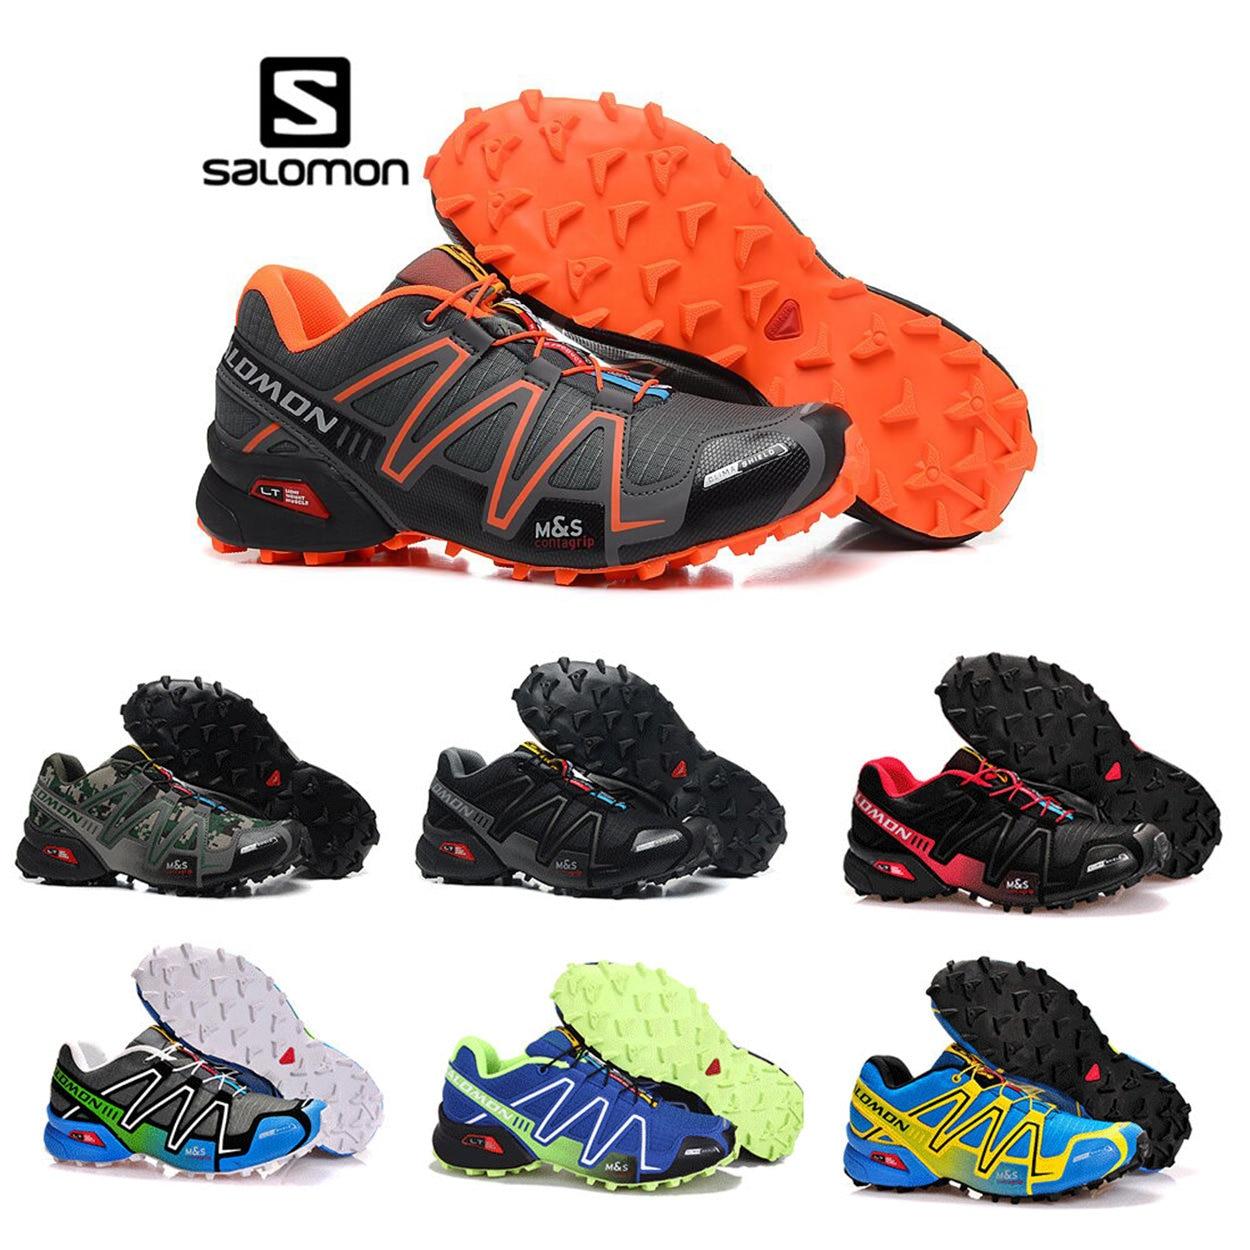 Salomon Aliexpress Shoes Salomon Salomon Aliexpress Shoes Aliexpress Shoes JcF1TlK